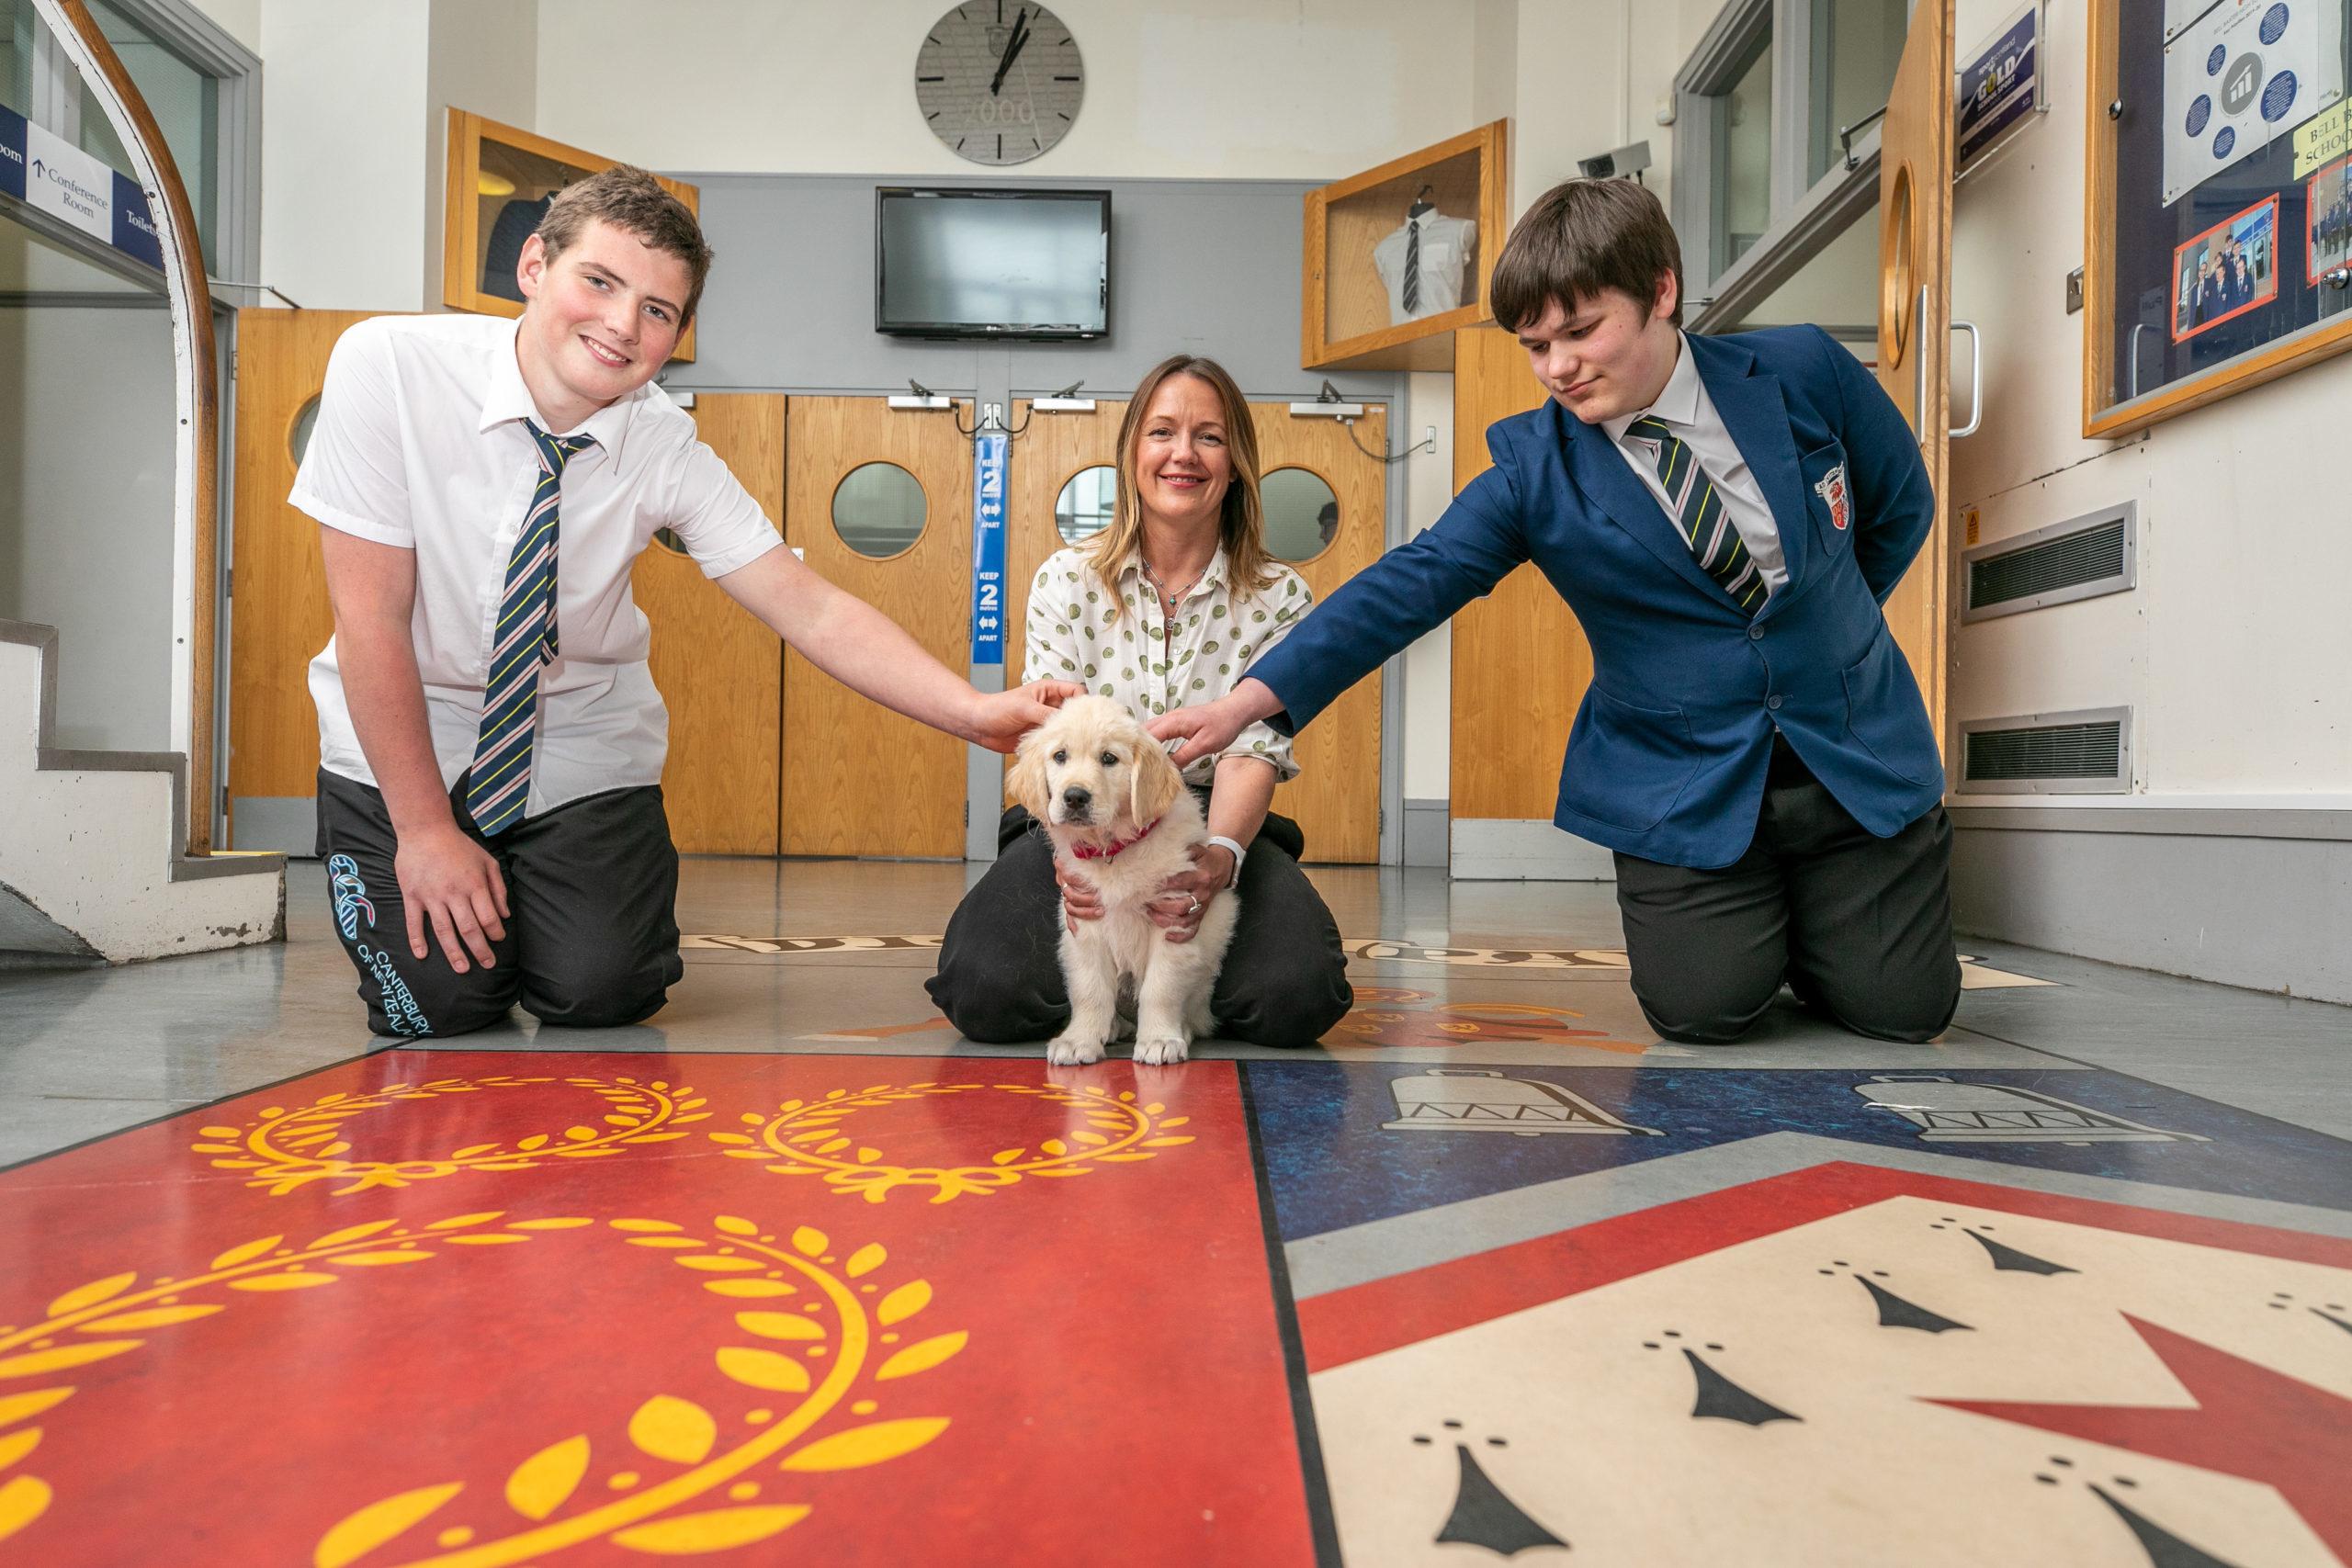 Pupils Logan Fenton and Callum Christie welcomed therapy dog Bella in July alongside headteacher Carol Ann Penrose.